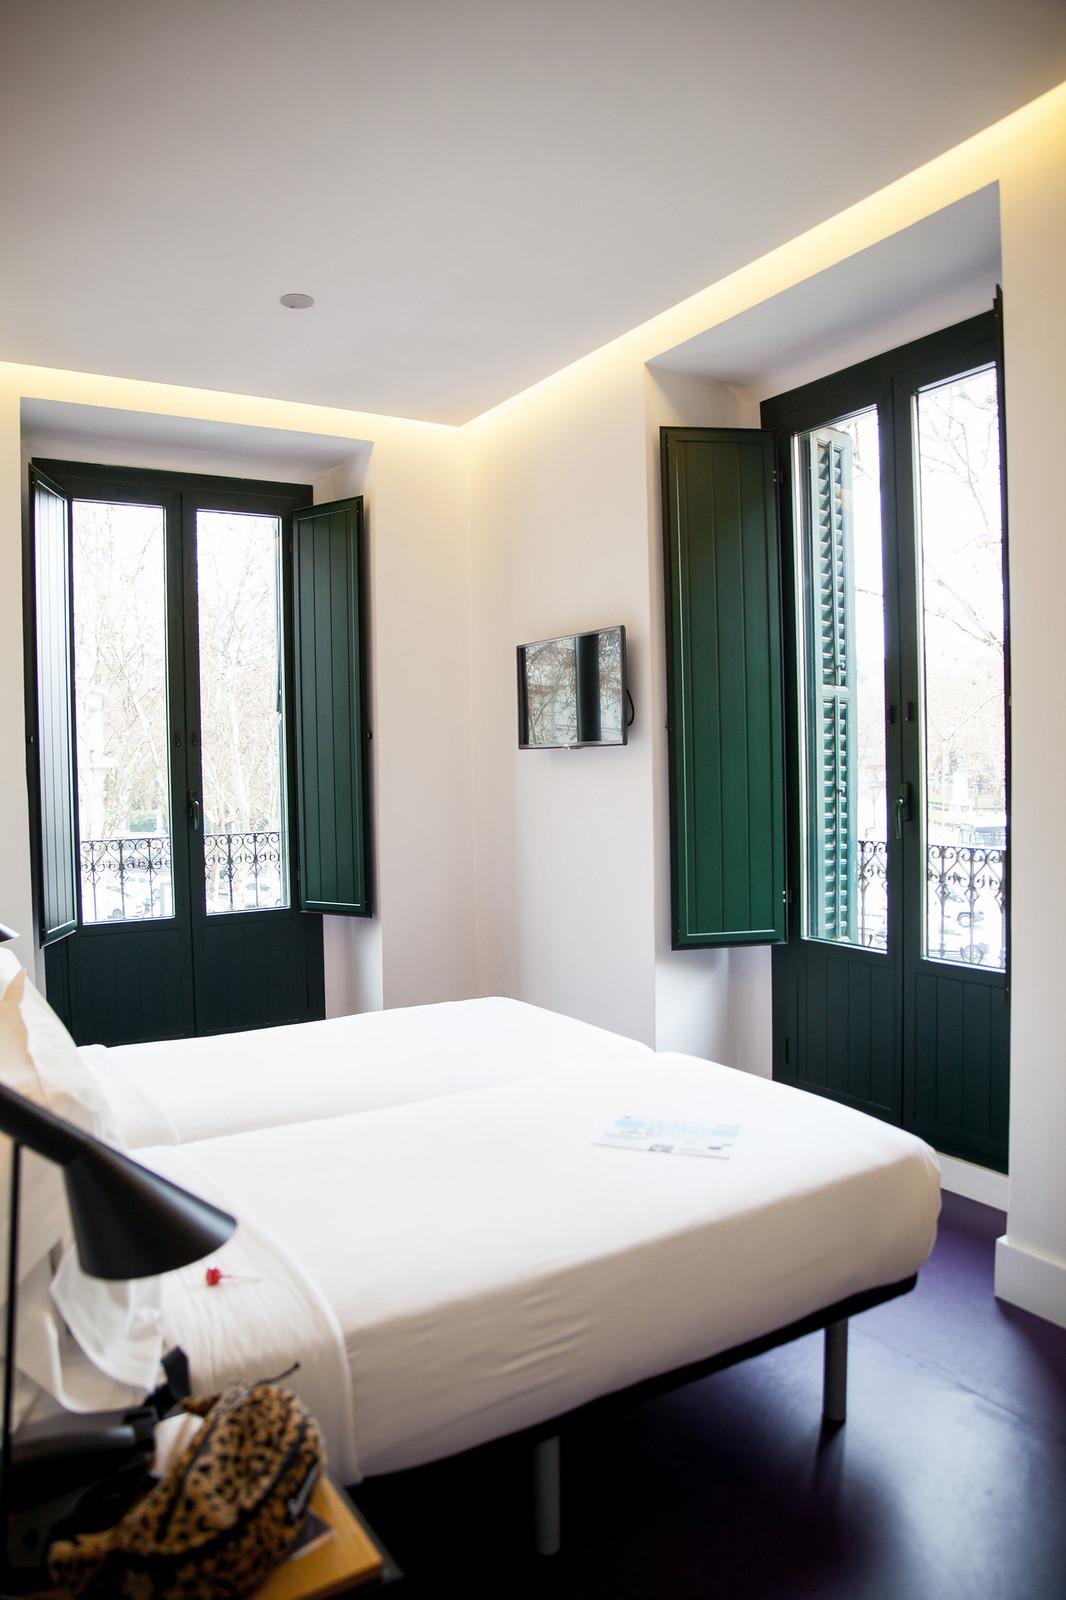 sleep atocha hotel madrid por 50 euros supreme theguestgirl influencer barcelona